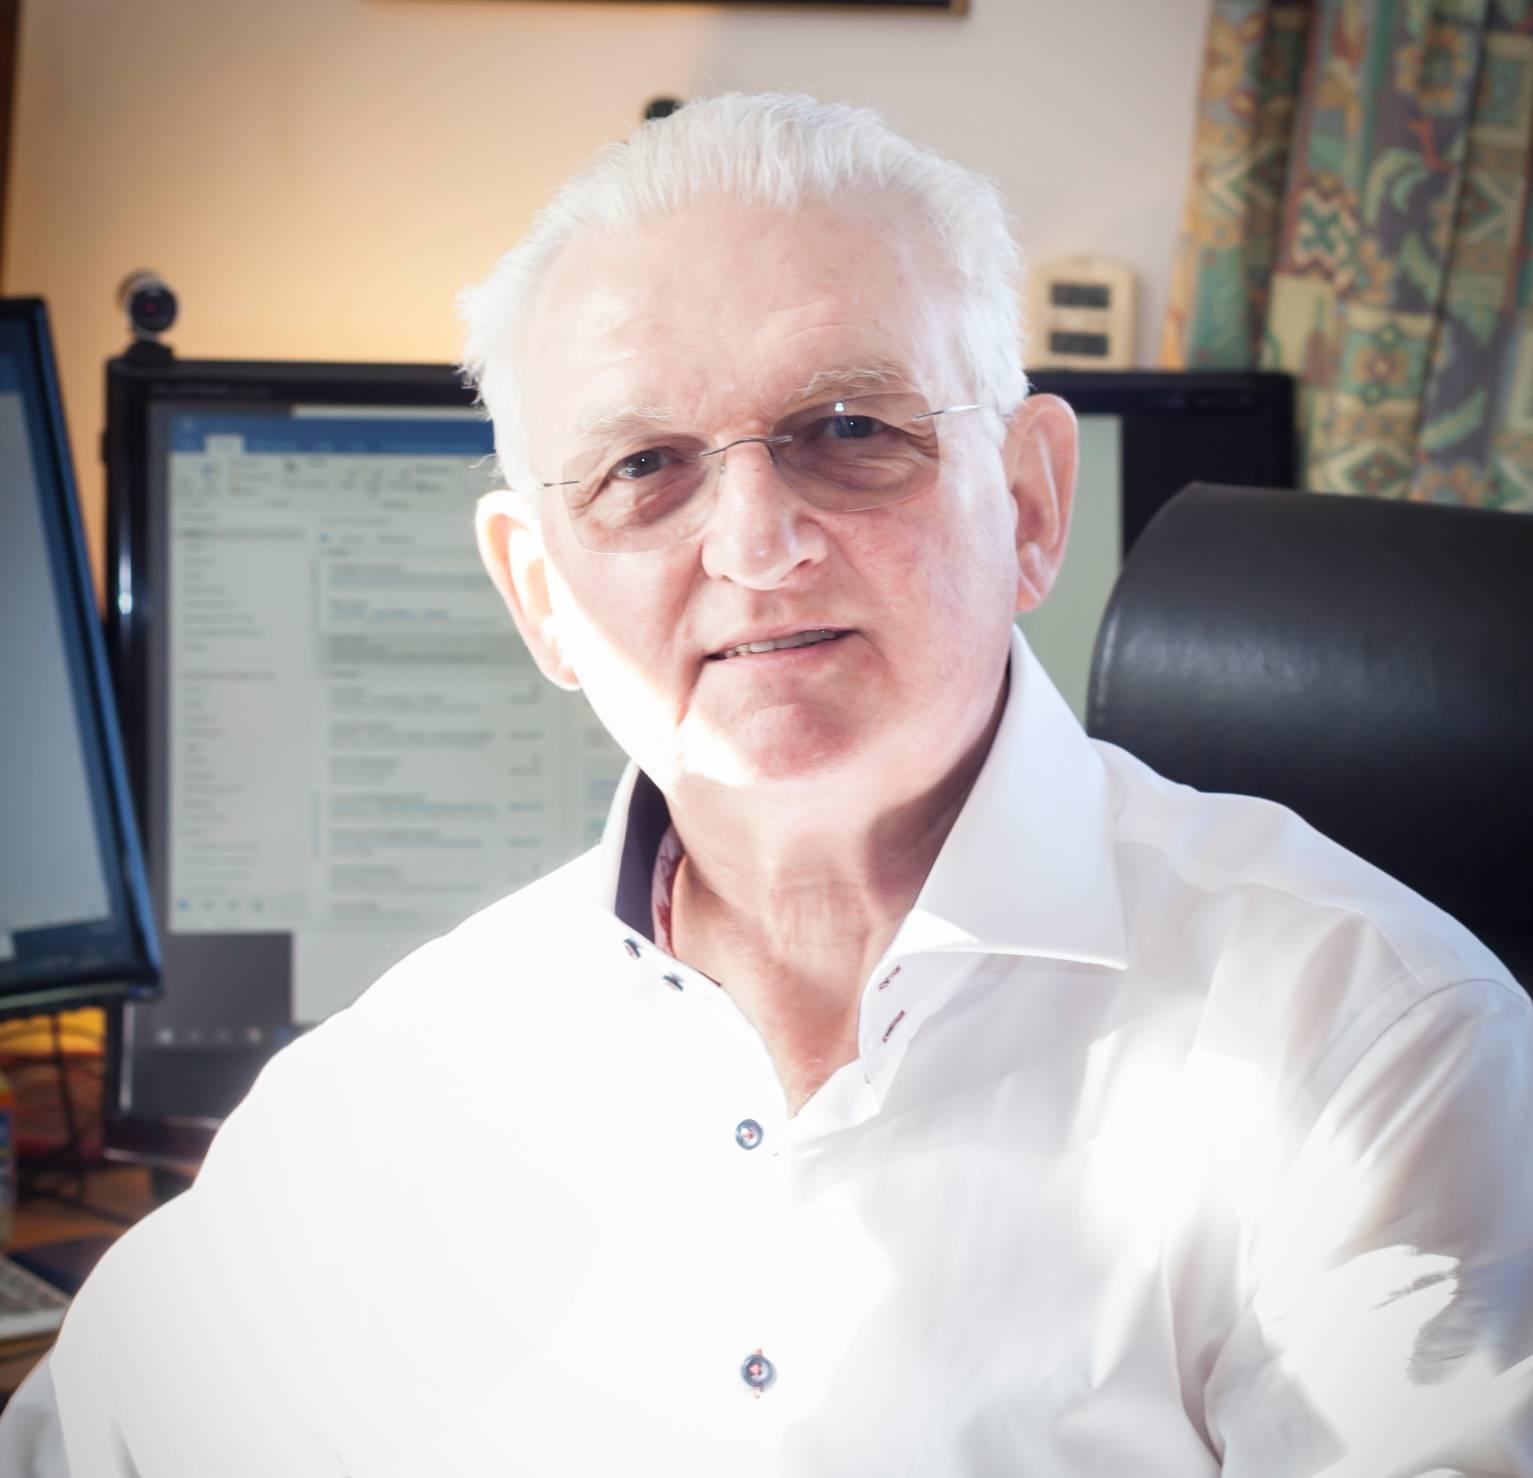 Chris Makin Mediator